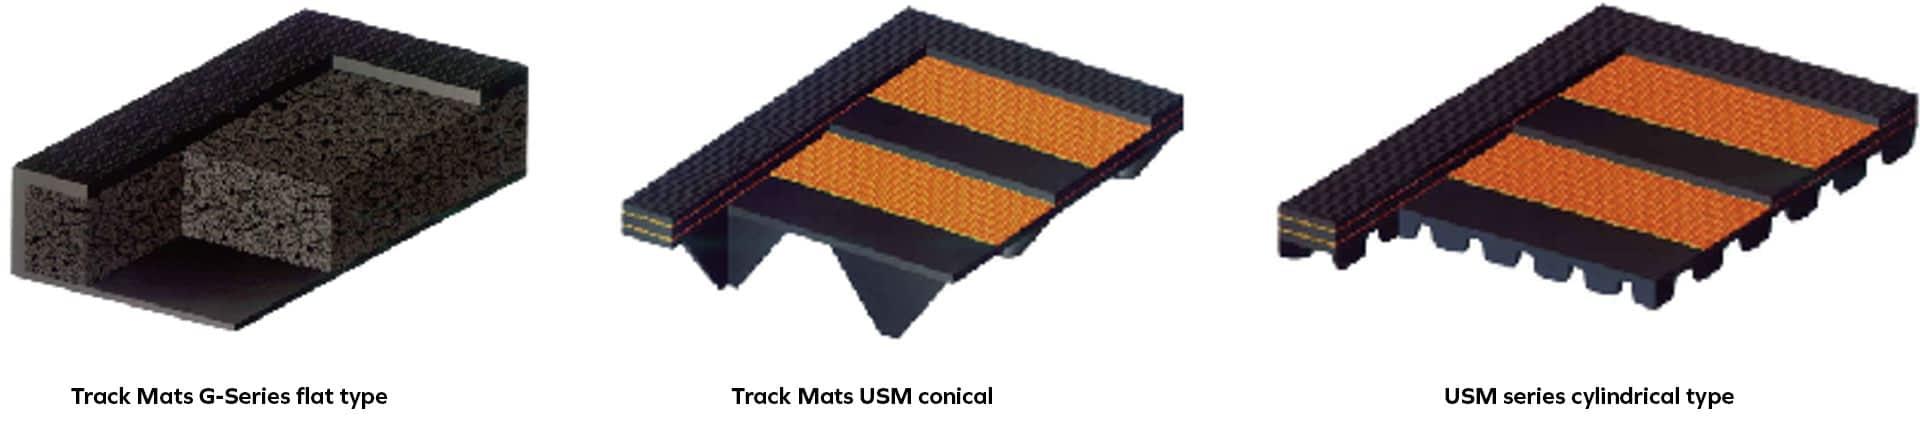 track-mats-technical